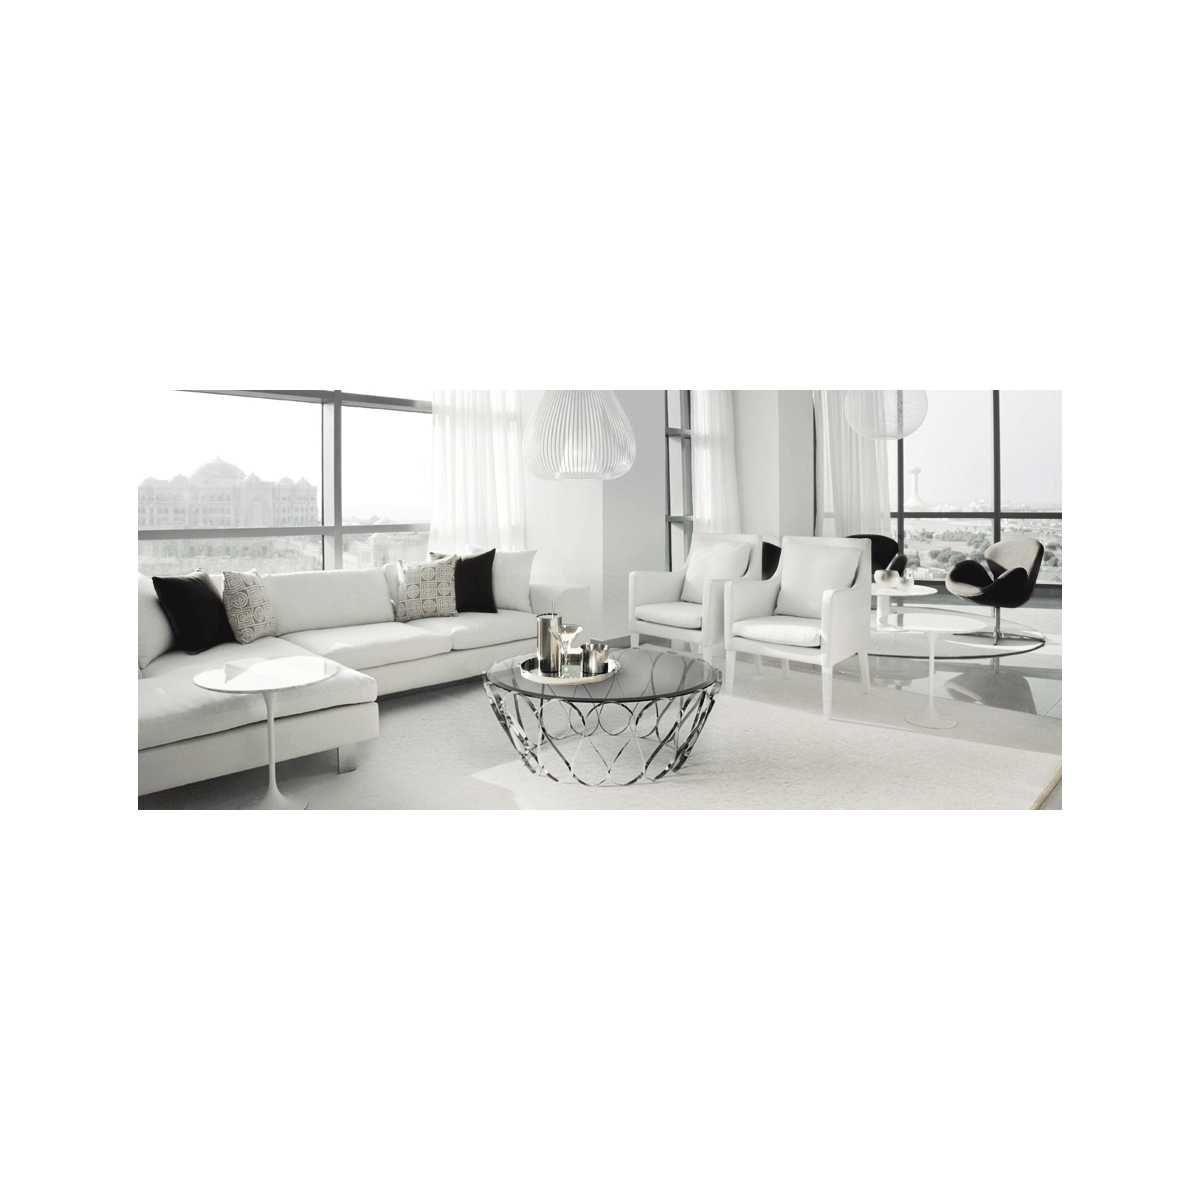 Aquarius Glass Coffee Table, Stainless Steel | Swanky Interiors Regarding Aquarius Dark Grey Sofa Chairs (View 19 of 20)